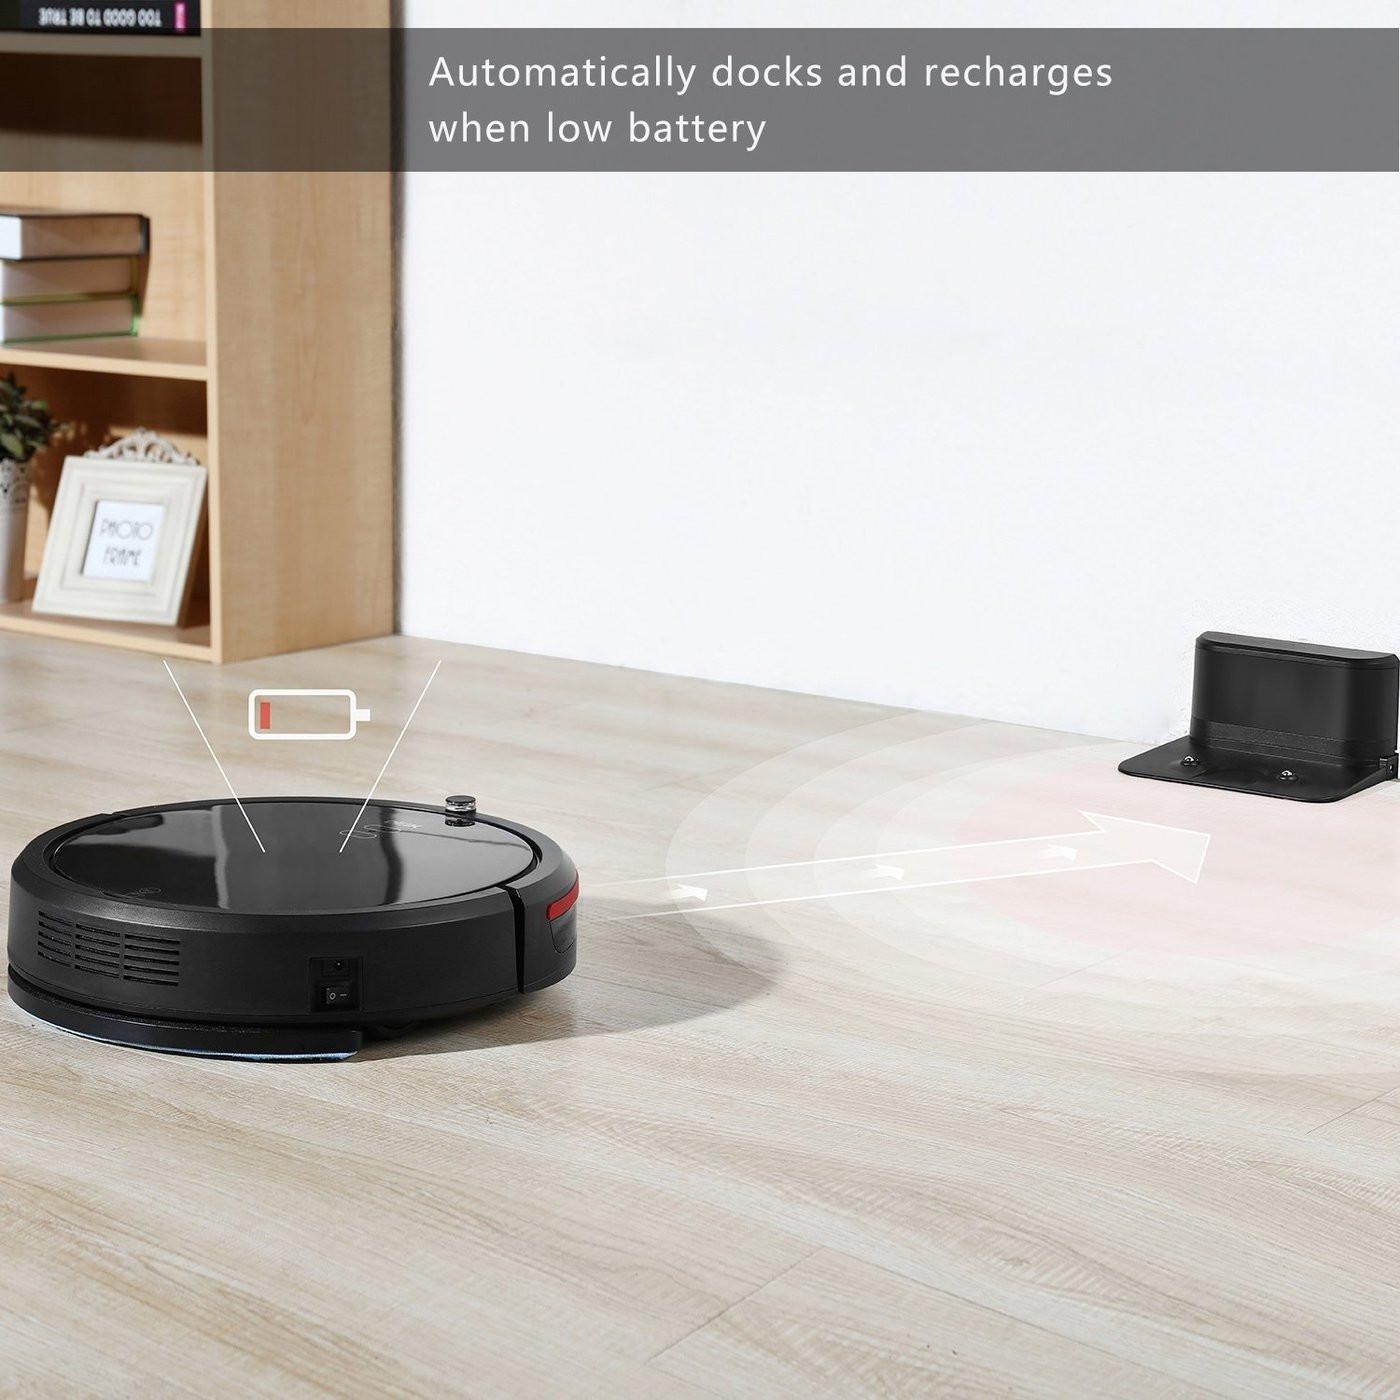 Robot Vacuum For Hardwood Floors